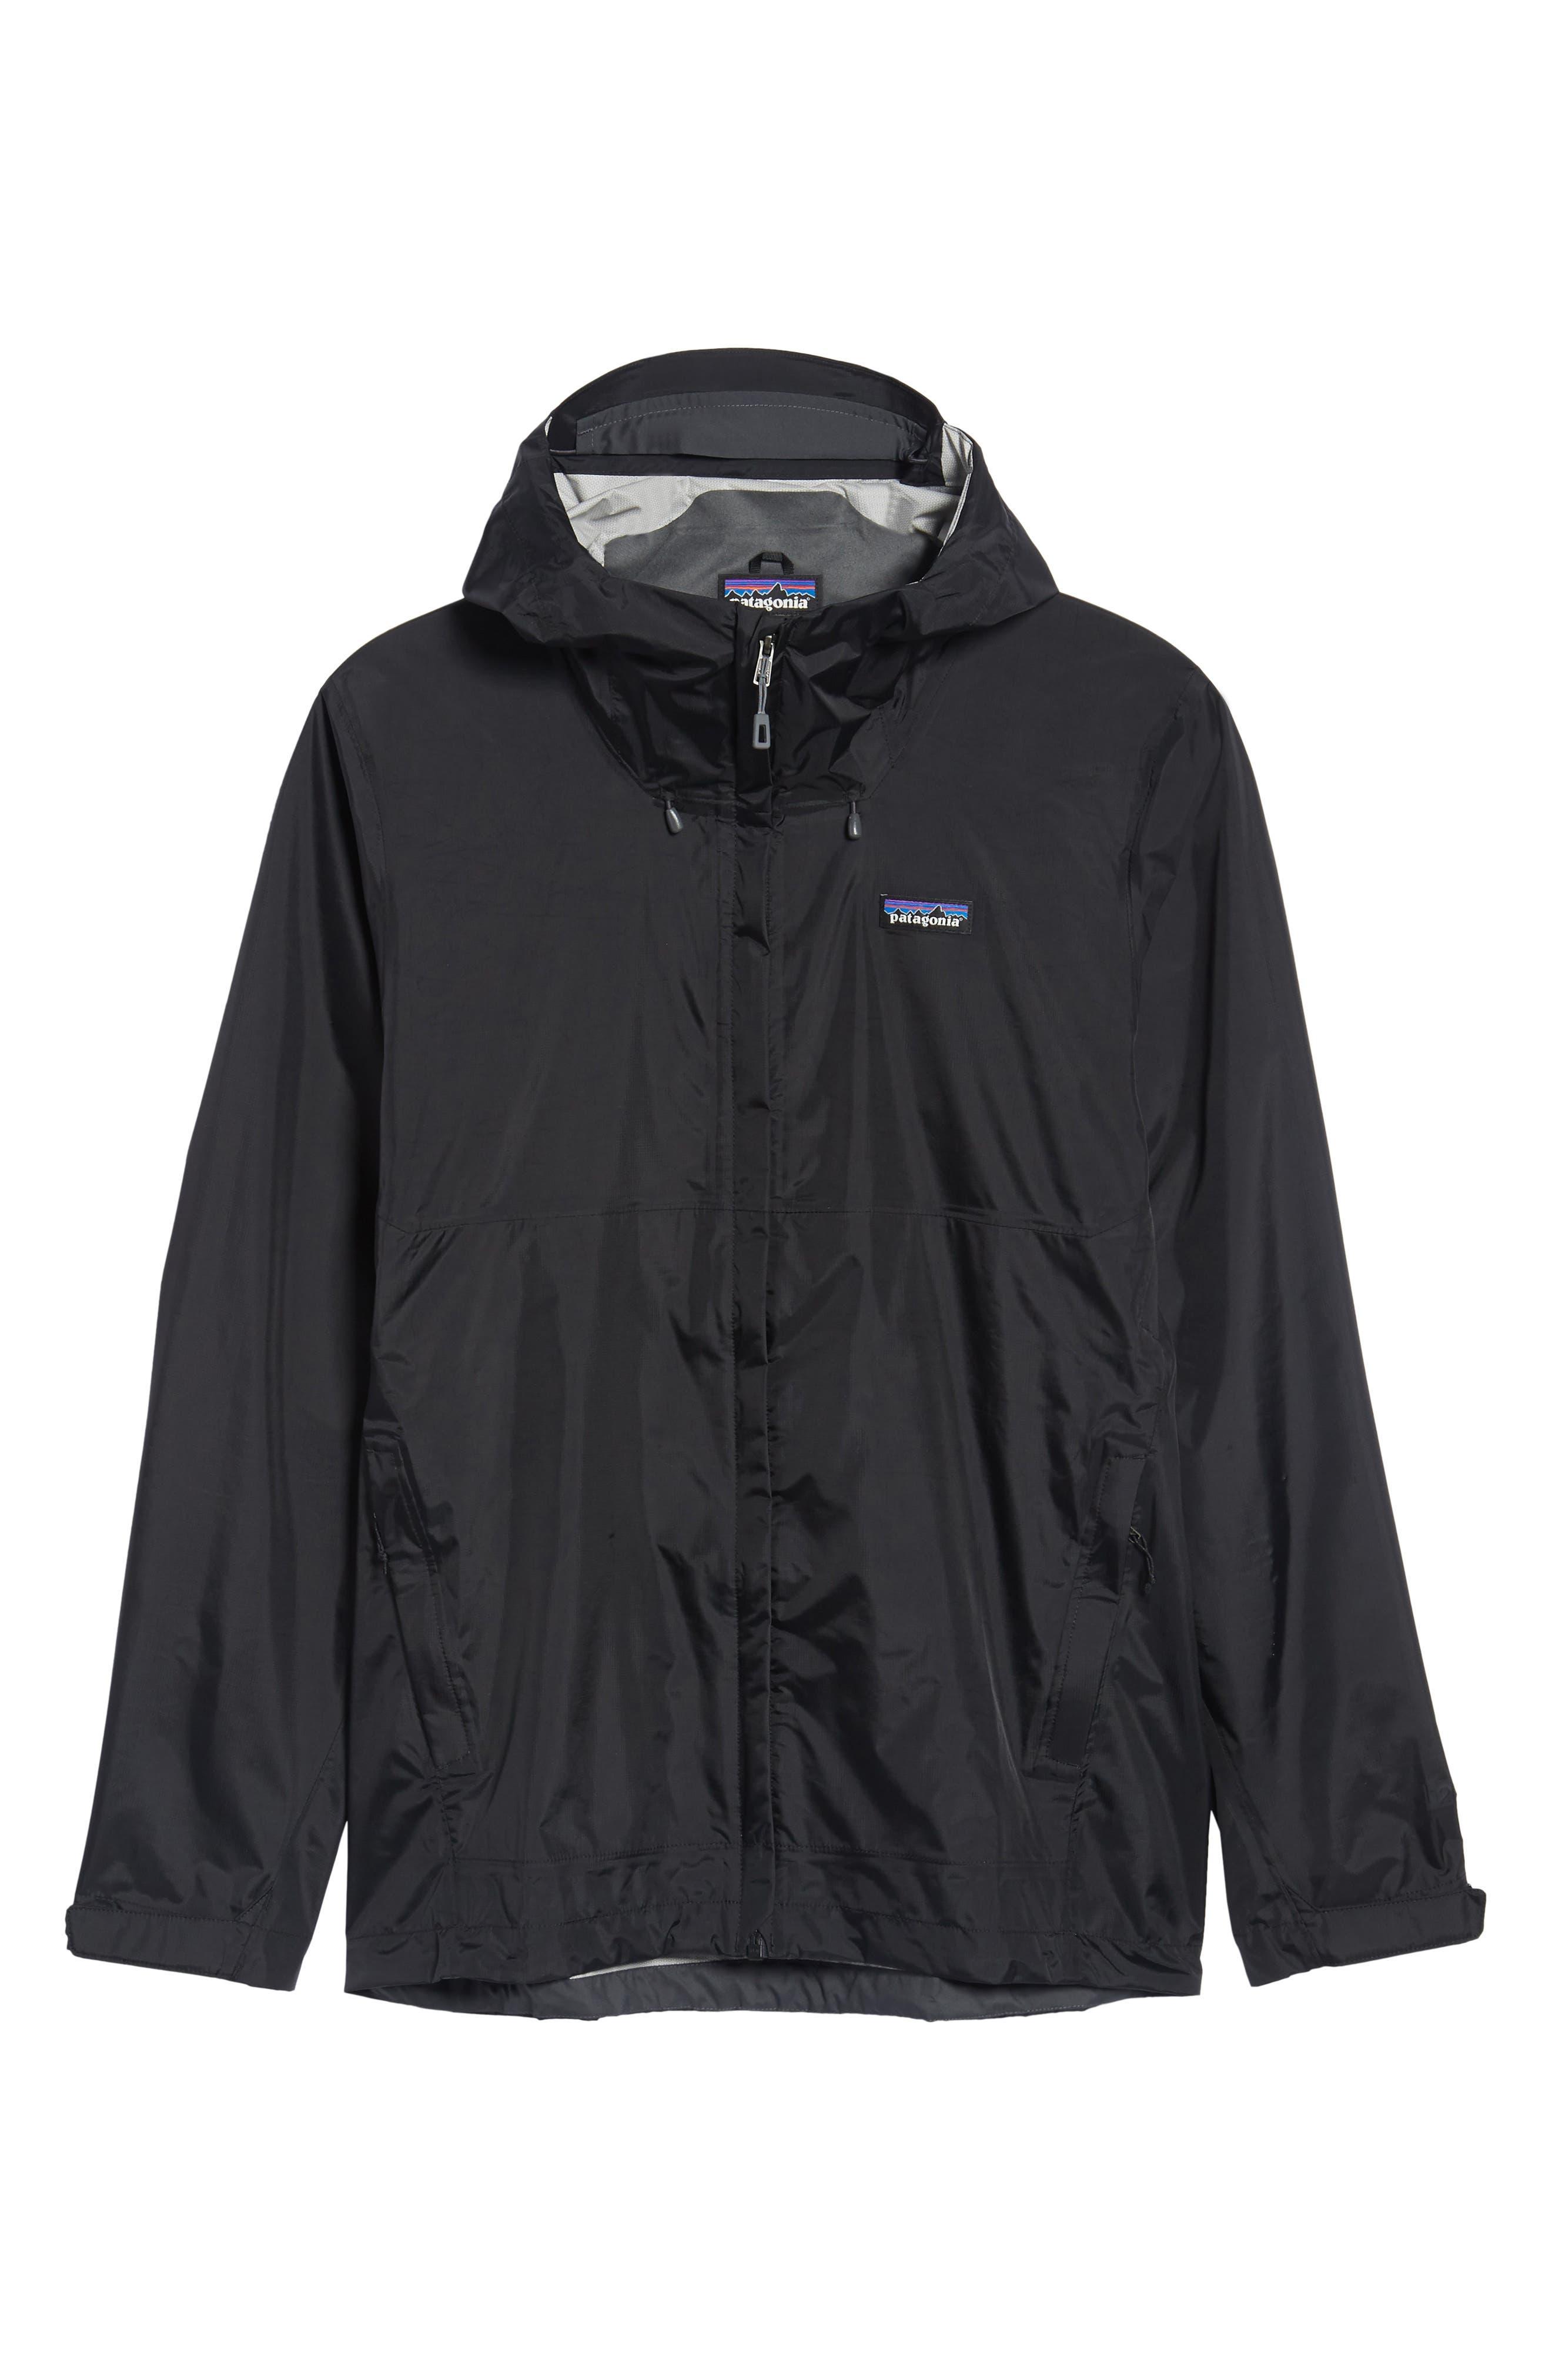 Torrentshell Packable Rain Jacket,                             Main thumbnail 1, color,                             BLACK